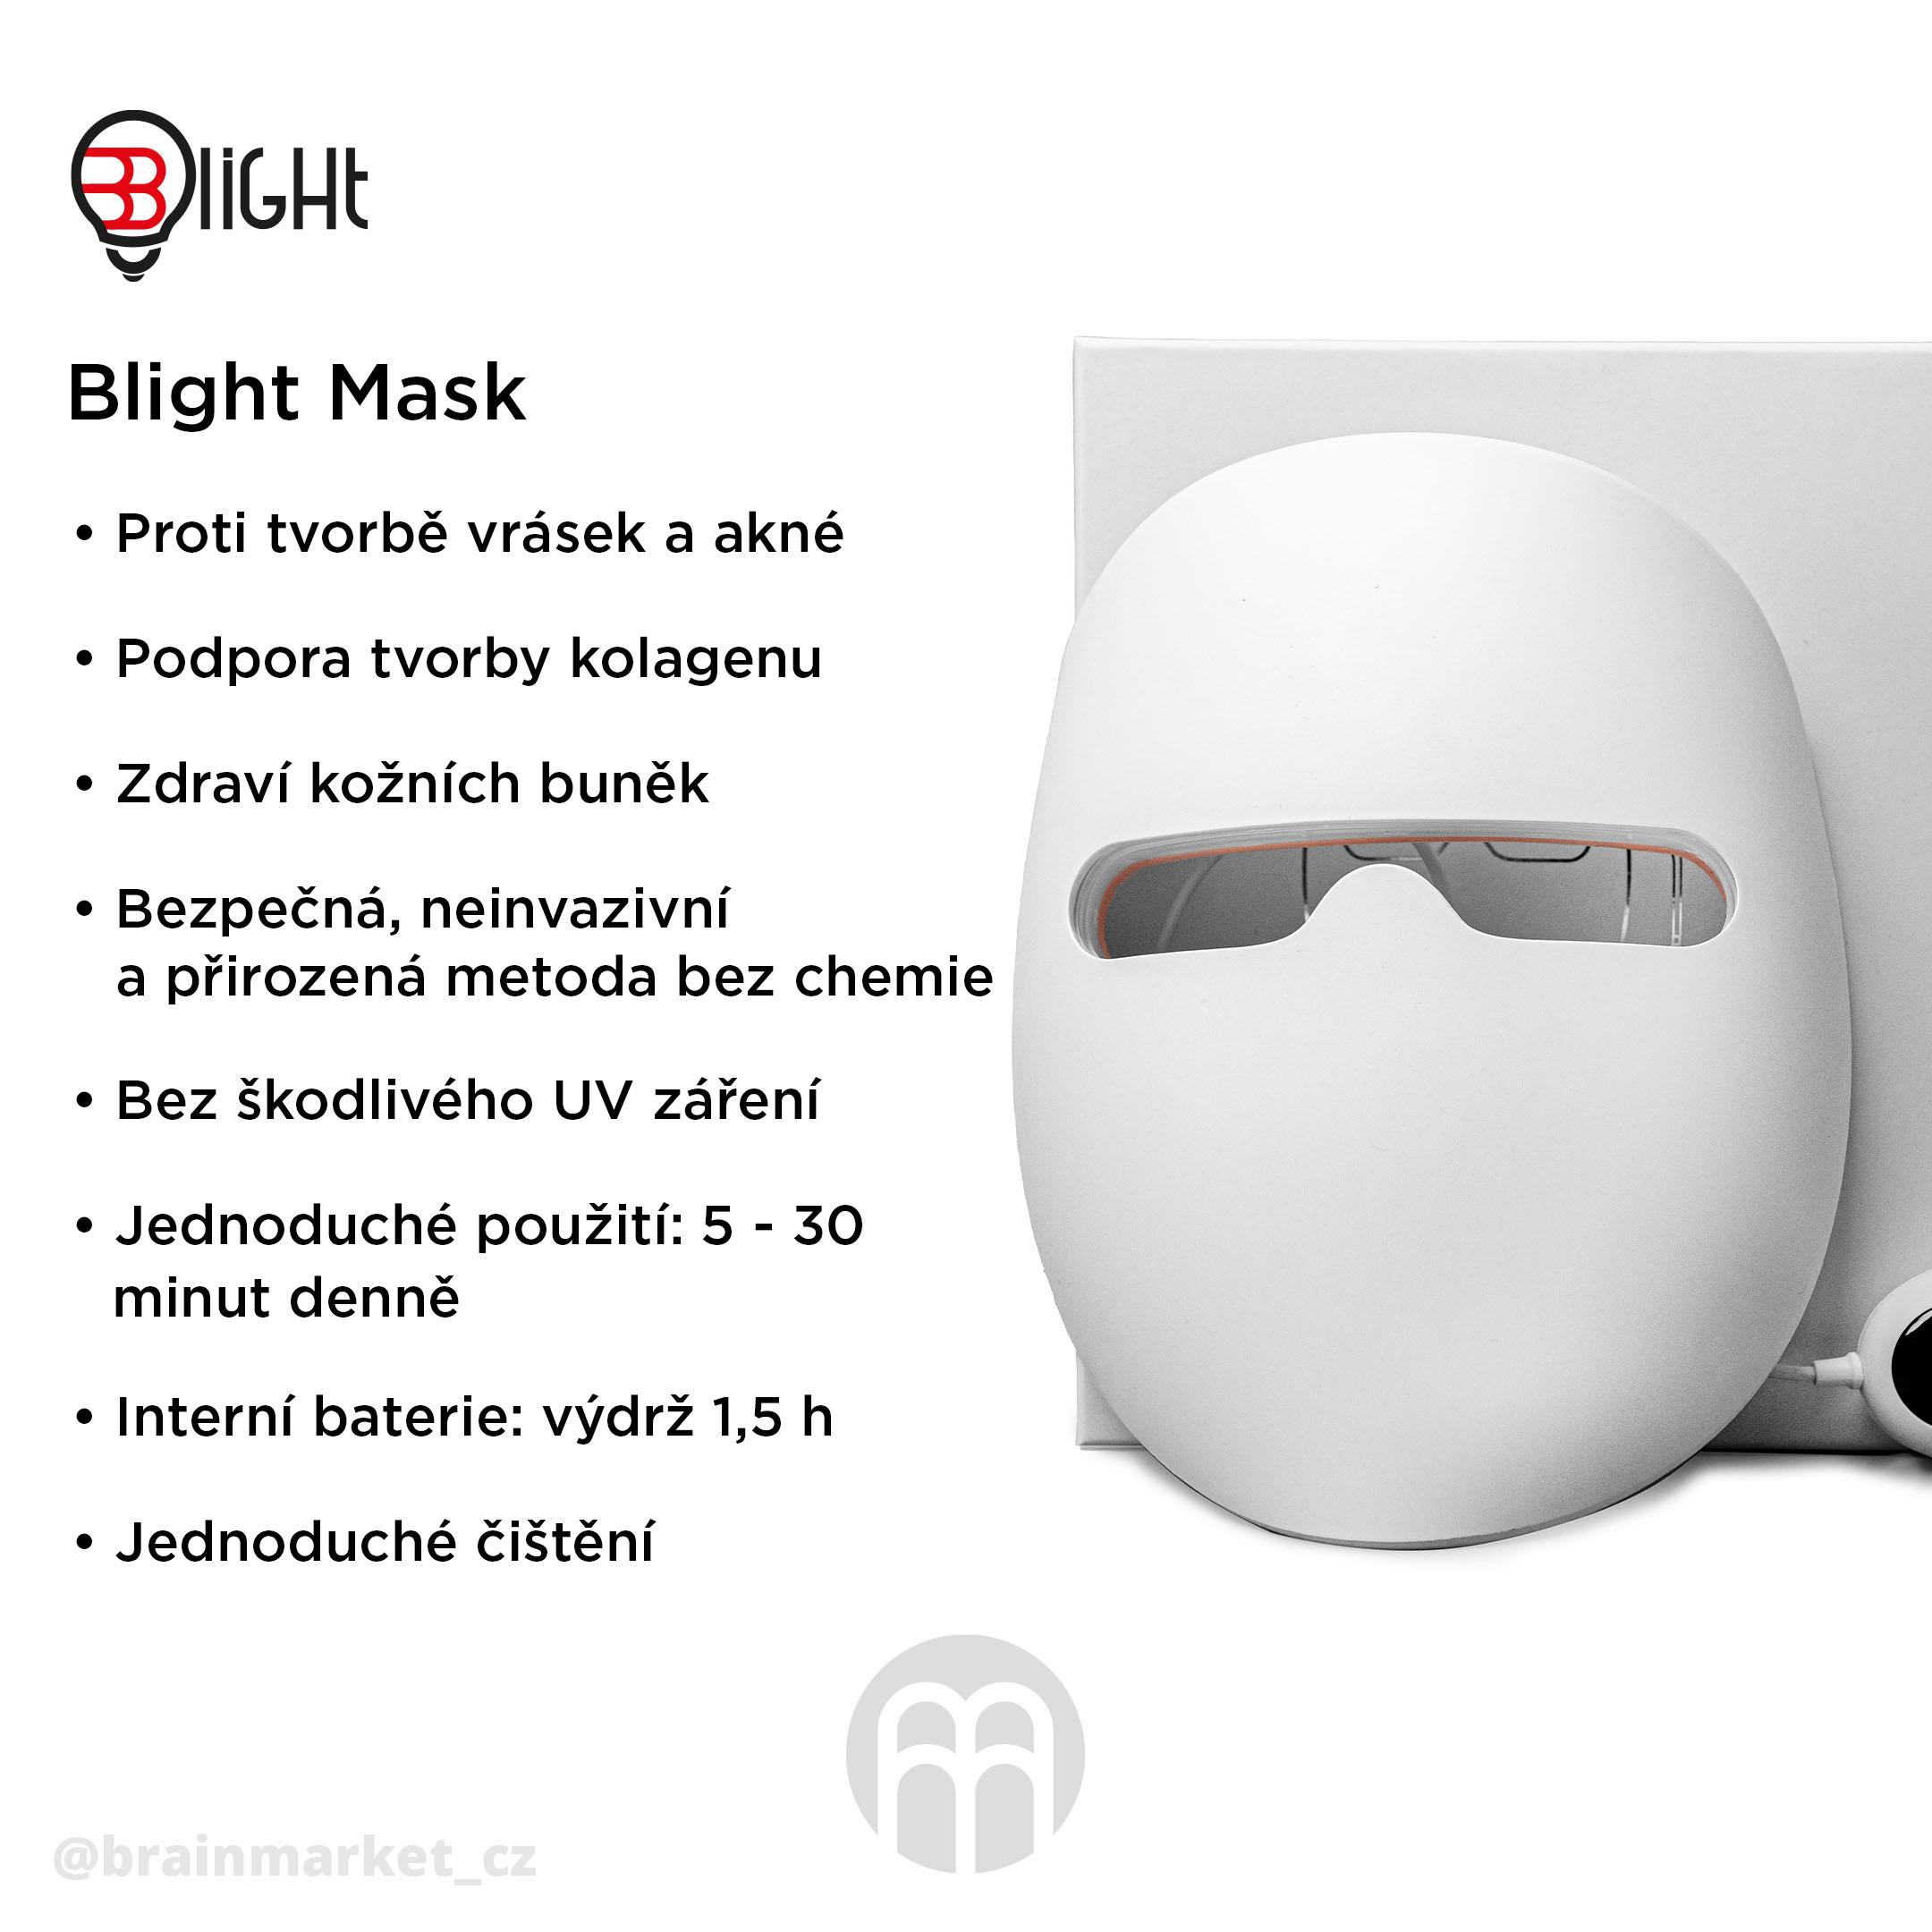 blight-mask-infografika-brainmarket-cz